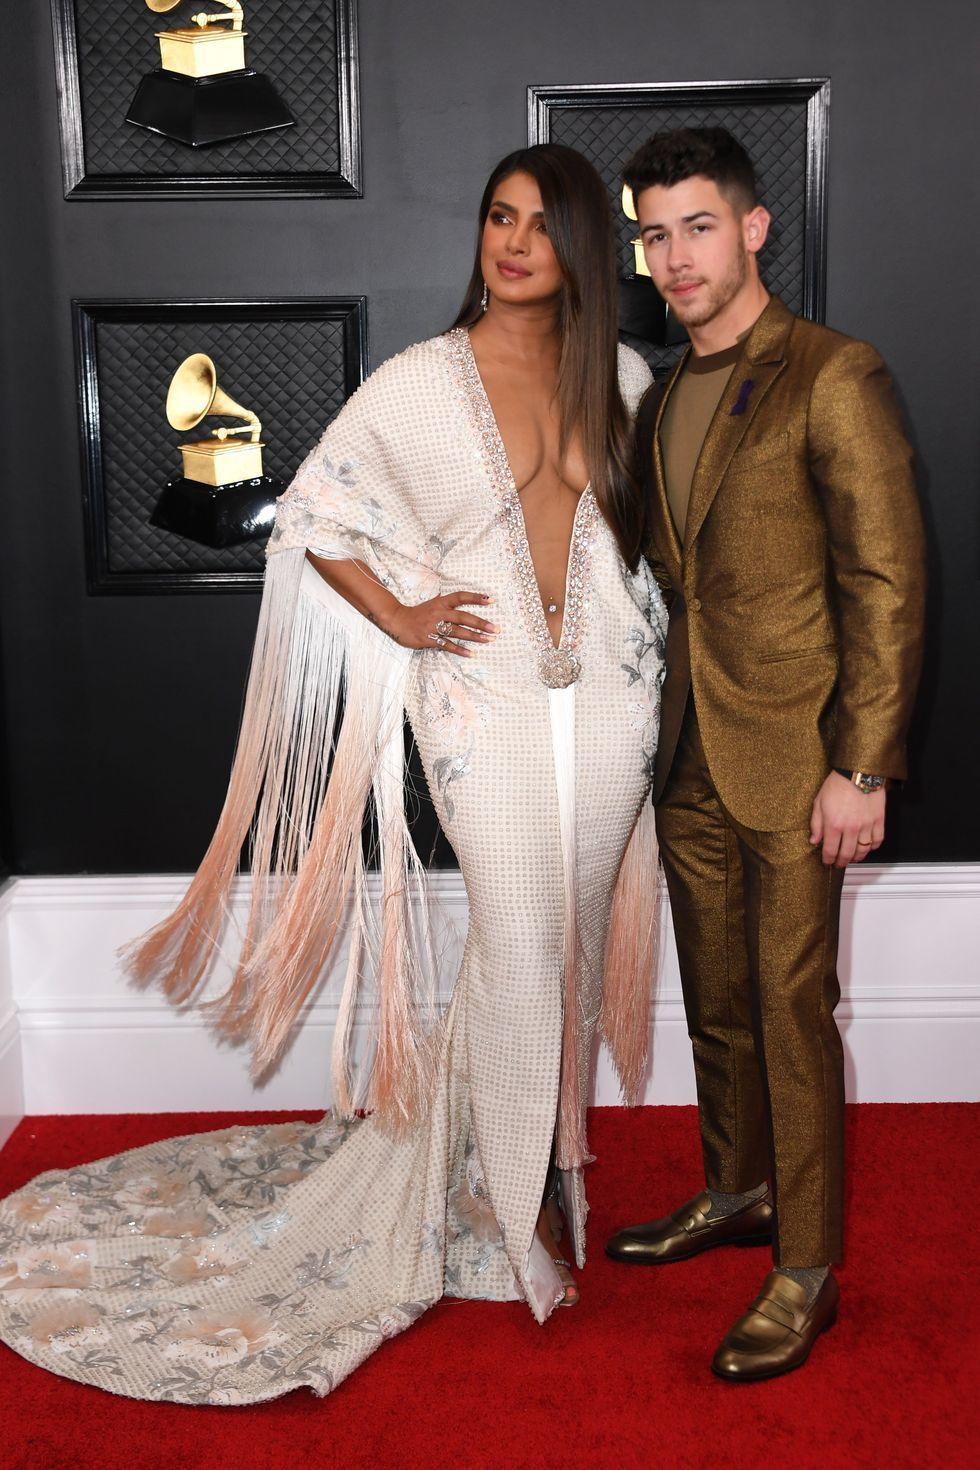 Pamer Tubuh, Ini Gaya Seksi Seleb Hollywood di Grammy Awards 2020